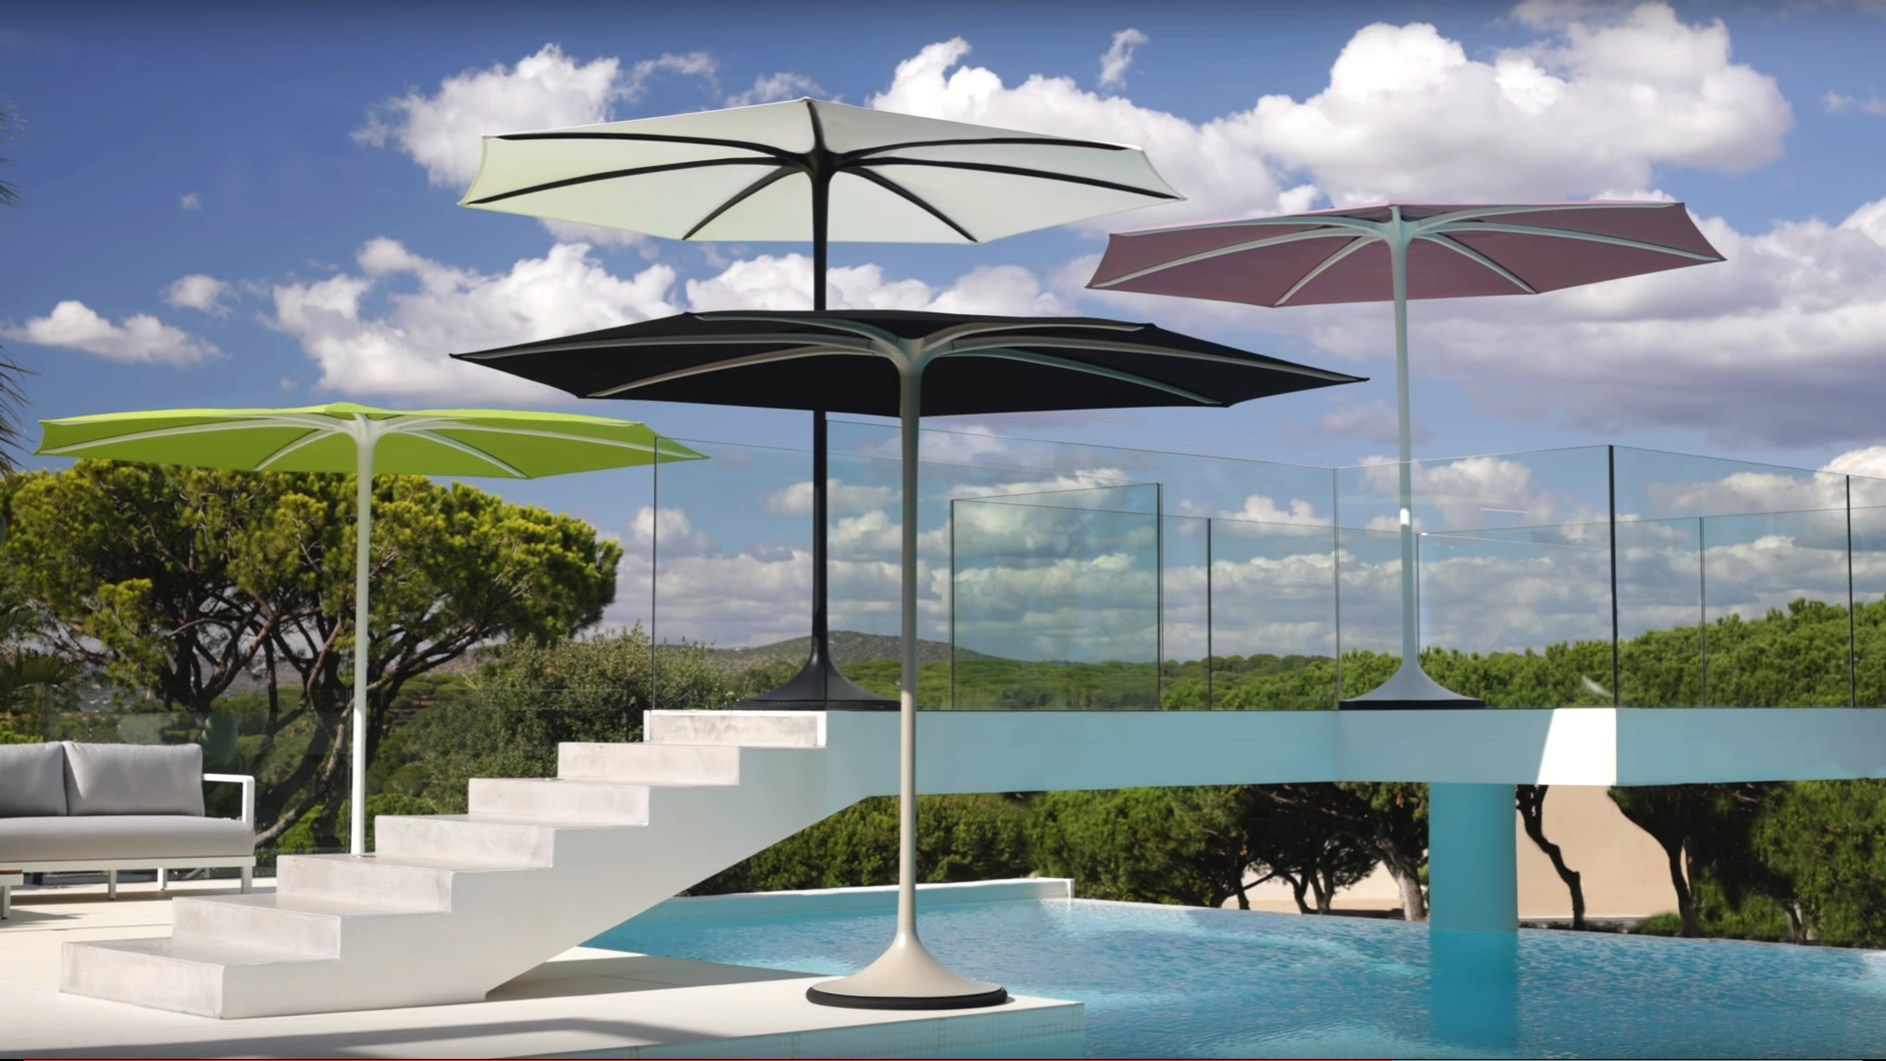 PALMA. The first automatic strutless garden umbrella